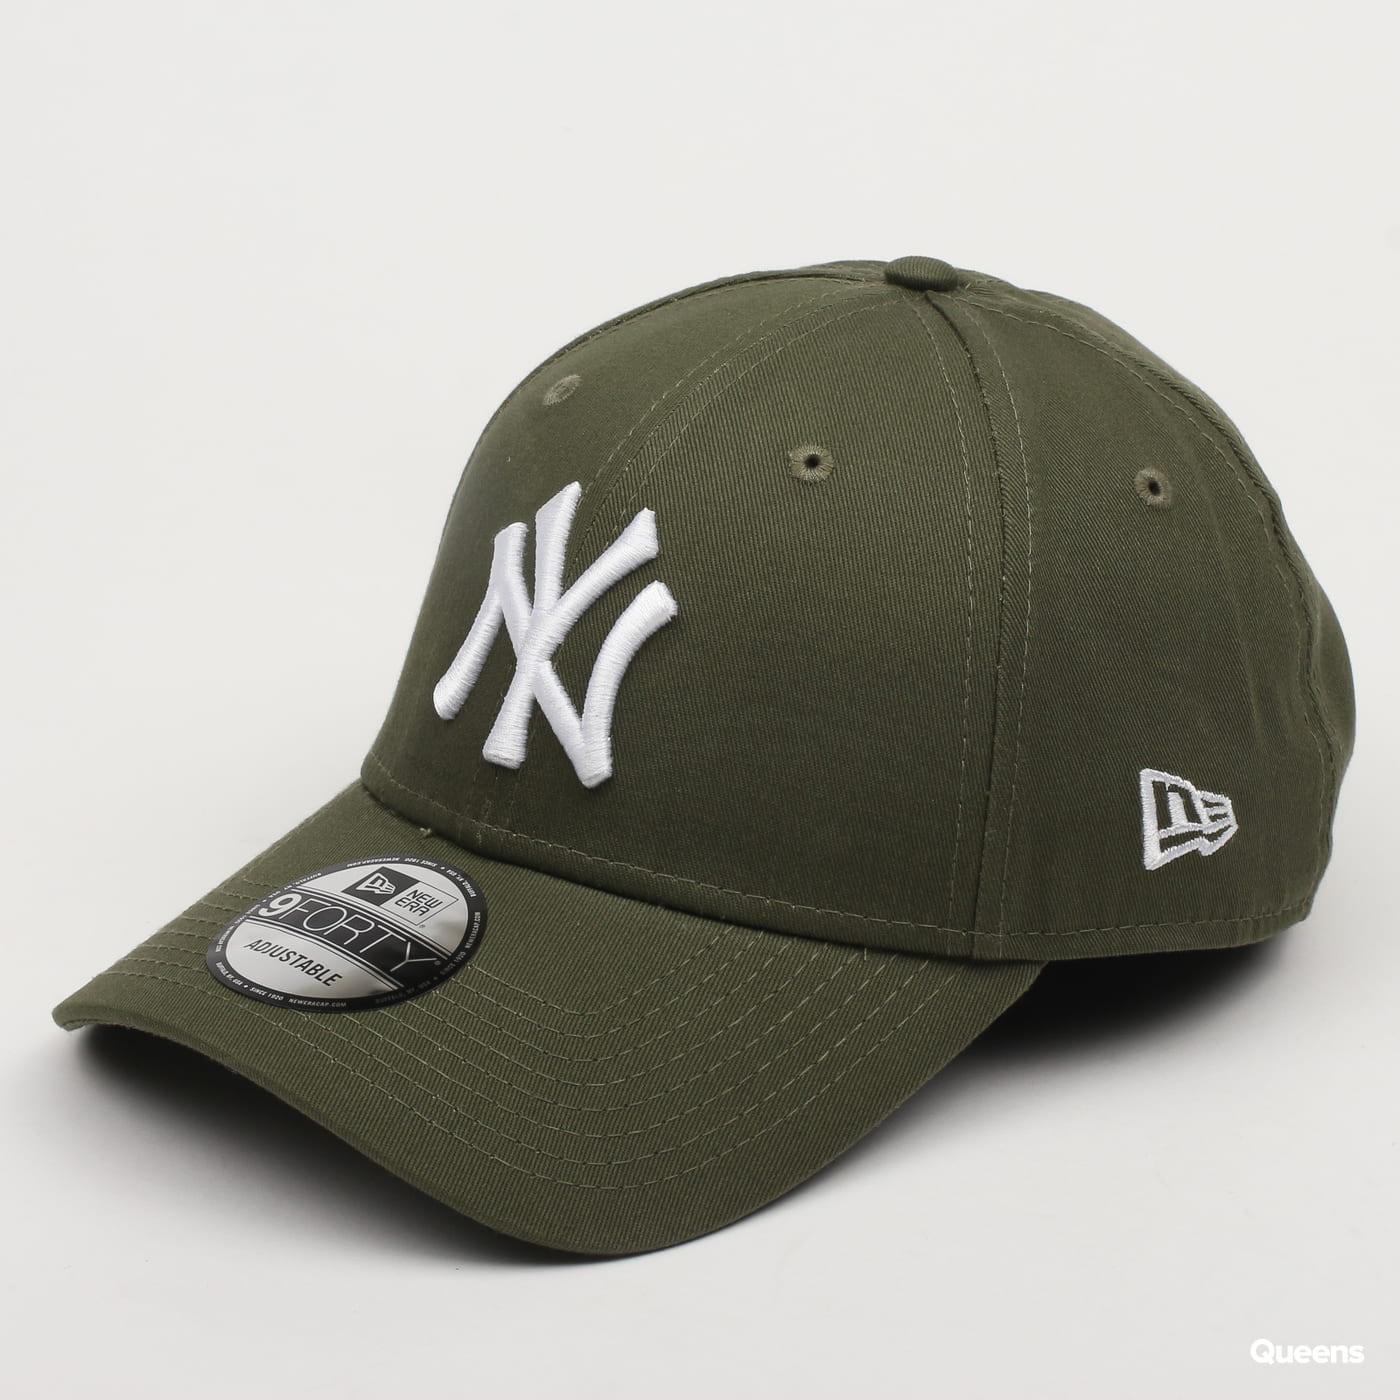 New Era 940 MLB League Essential NY C/O olive